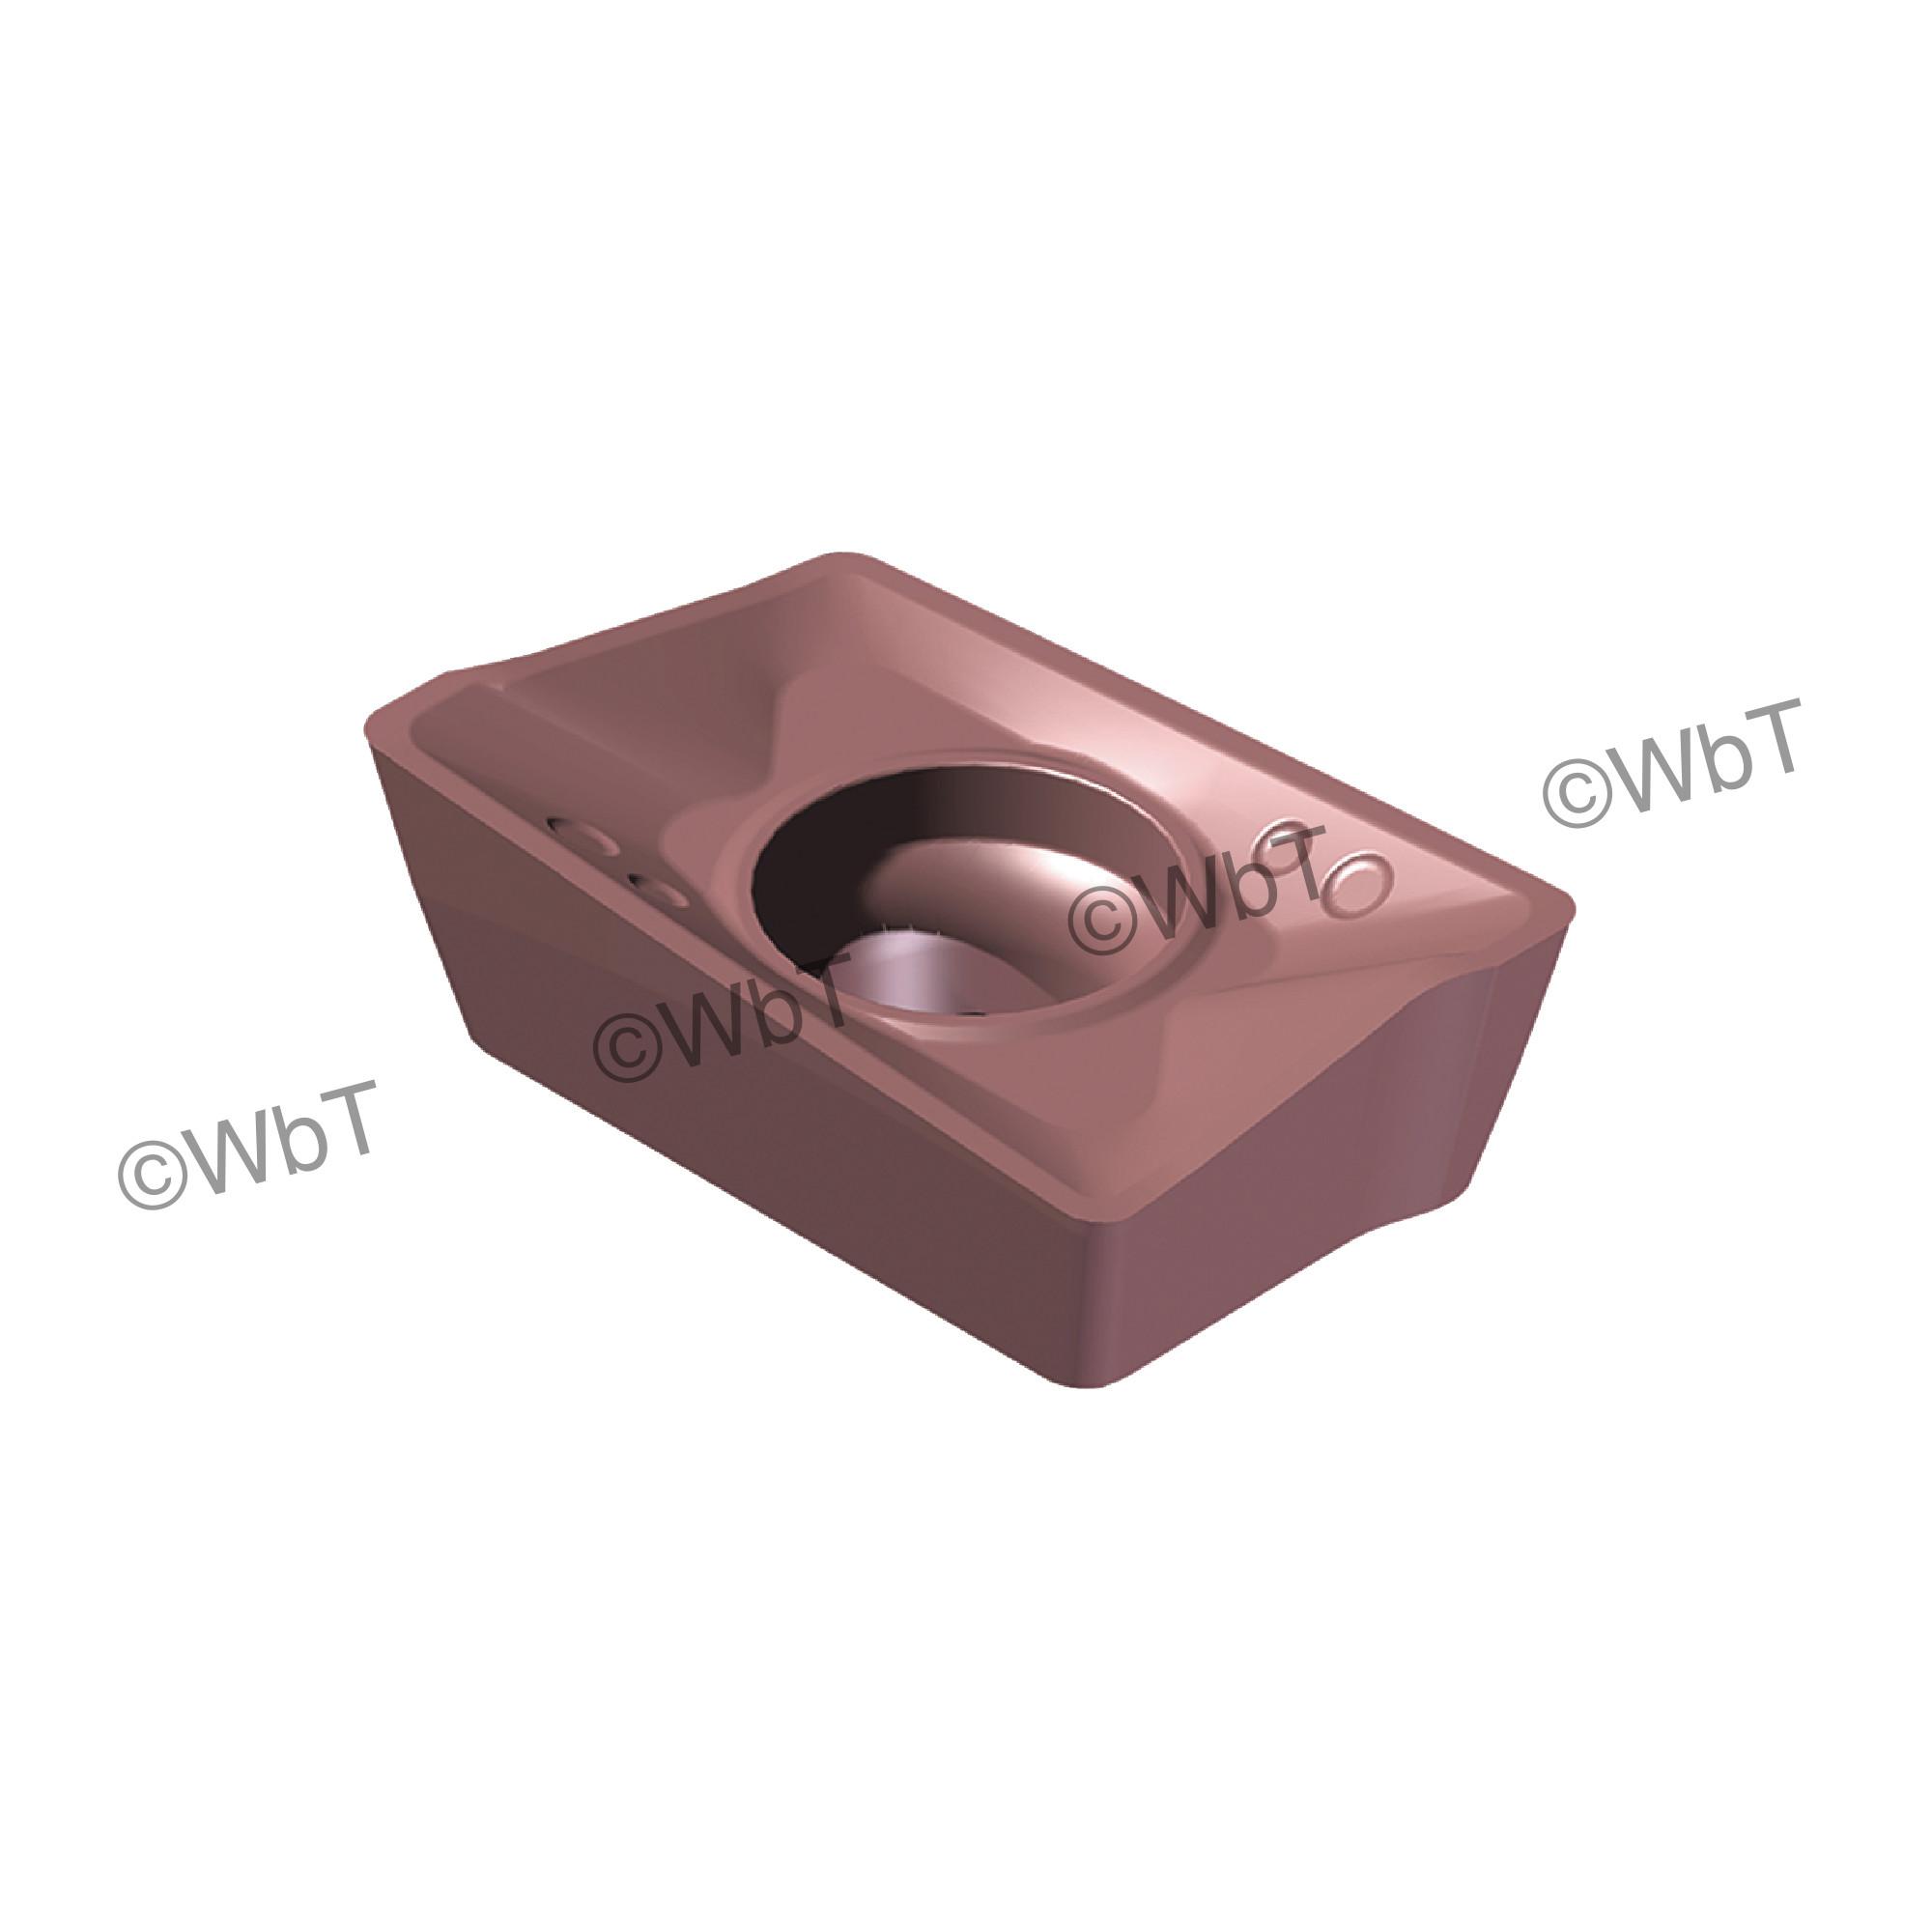 AKUMA - APKT1003PDR-R1 PM15K Parallelogram / Indexable Carbide Milling Insert